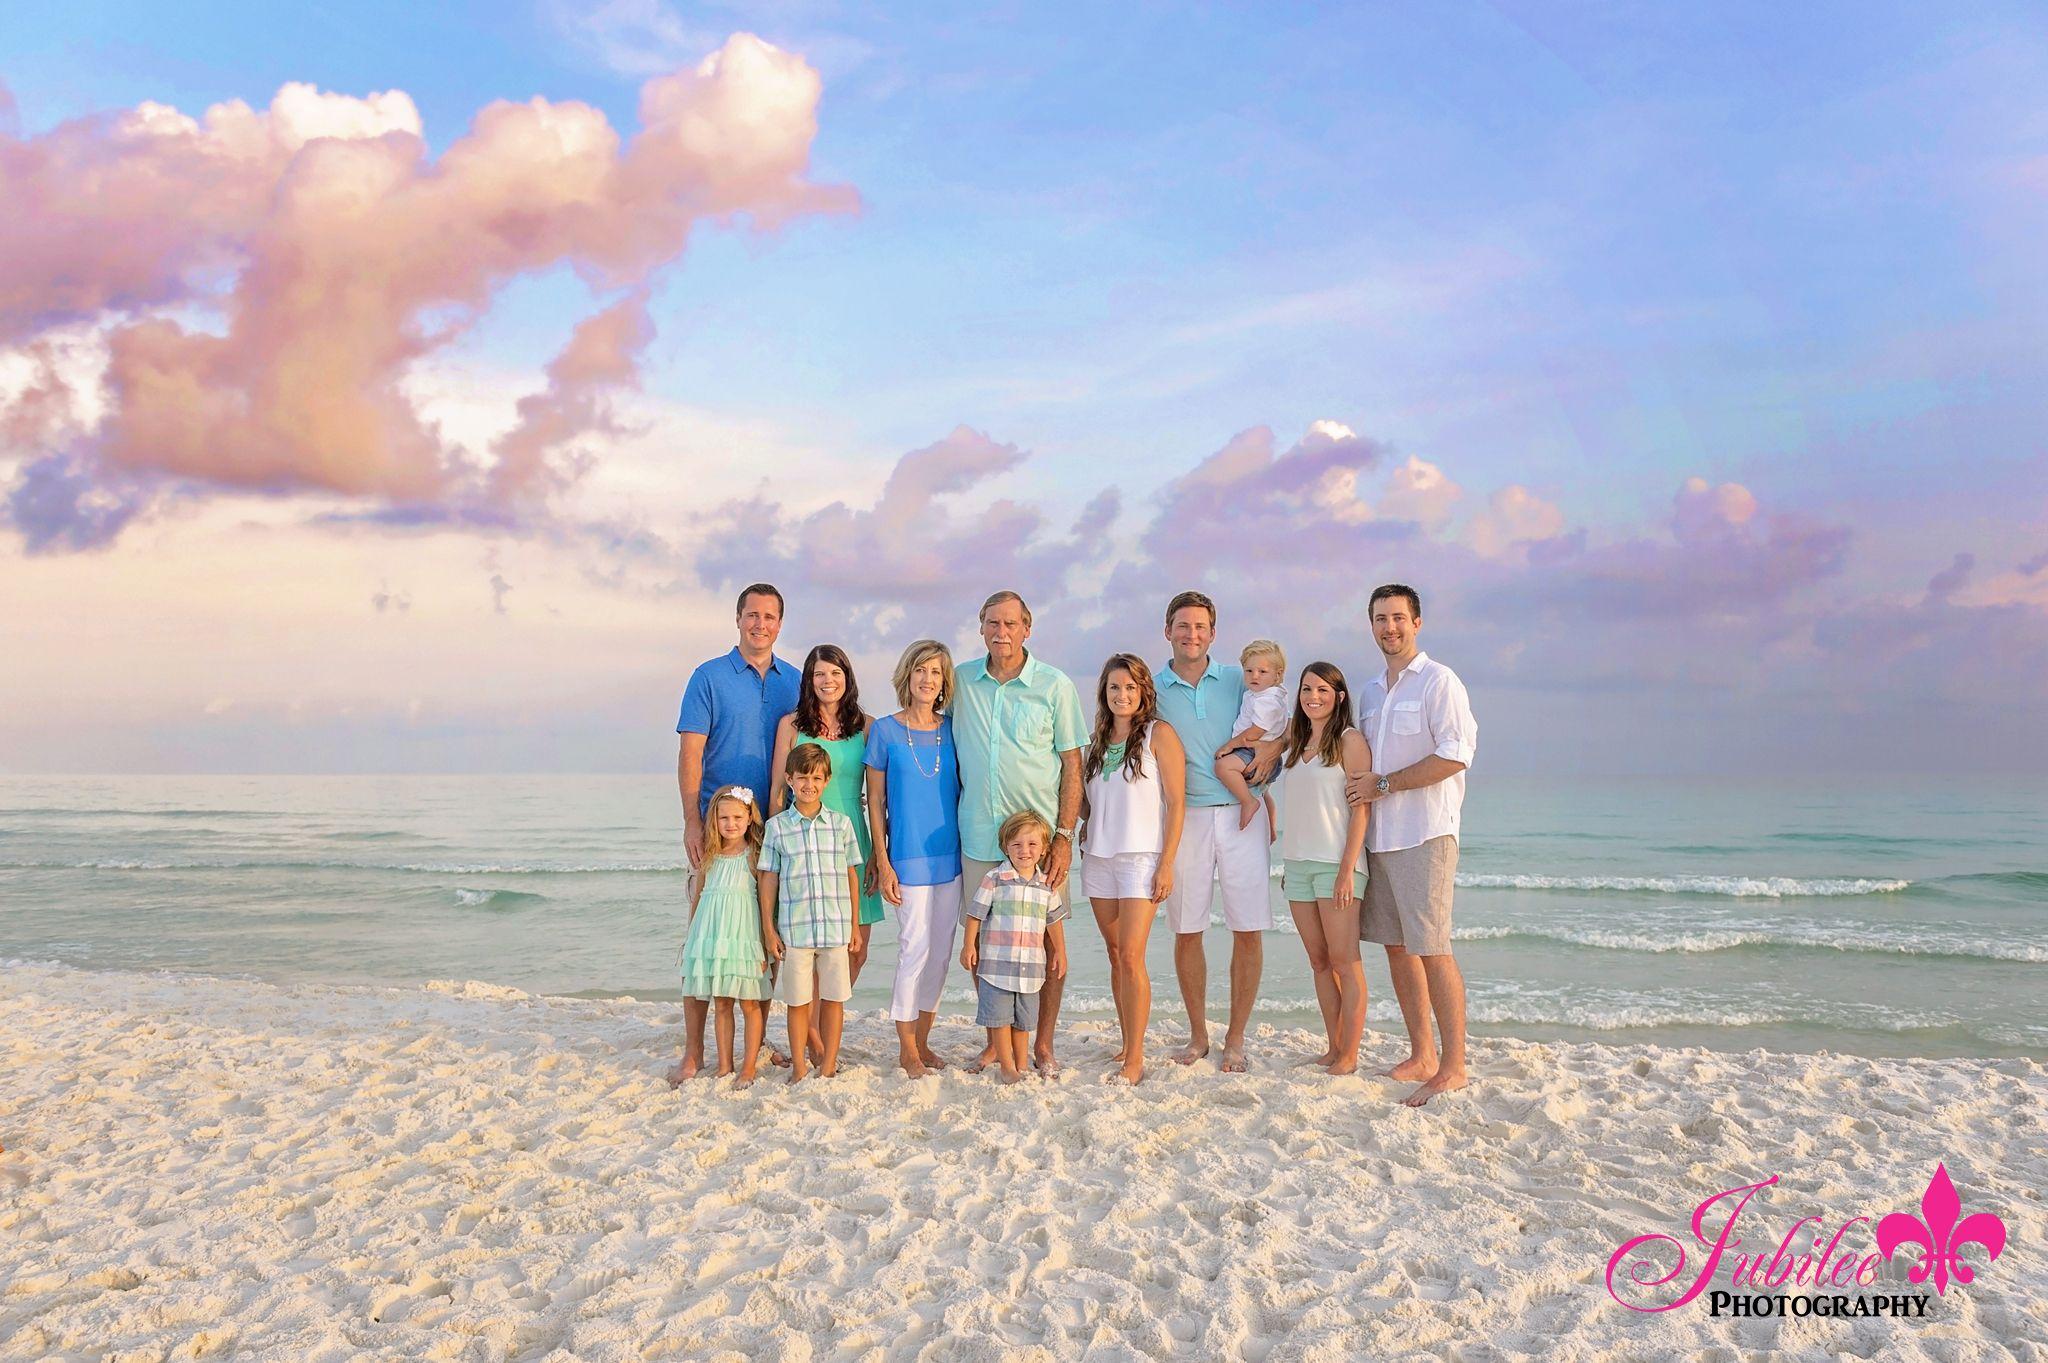 Destin Family Session Beach Photo Florida Photographer What To Wear For Photos